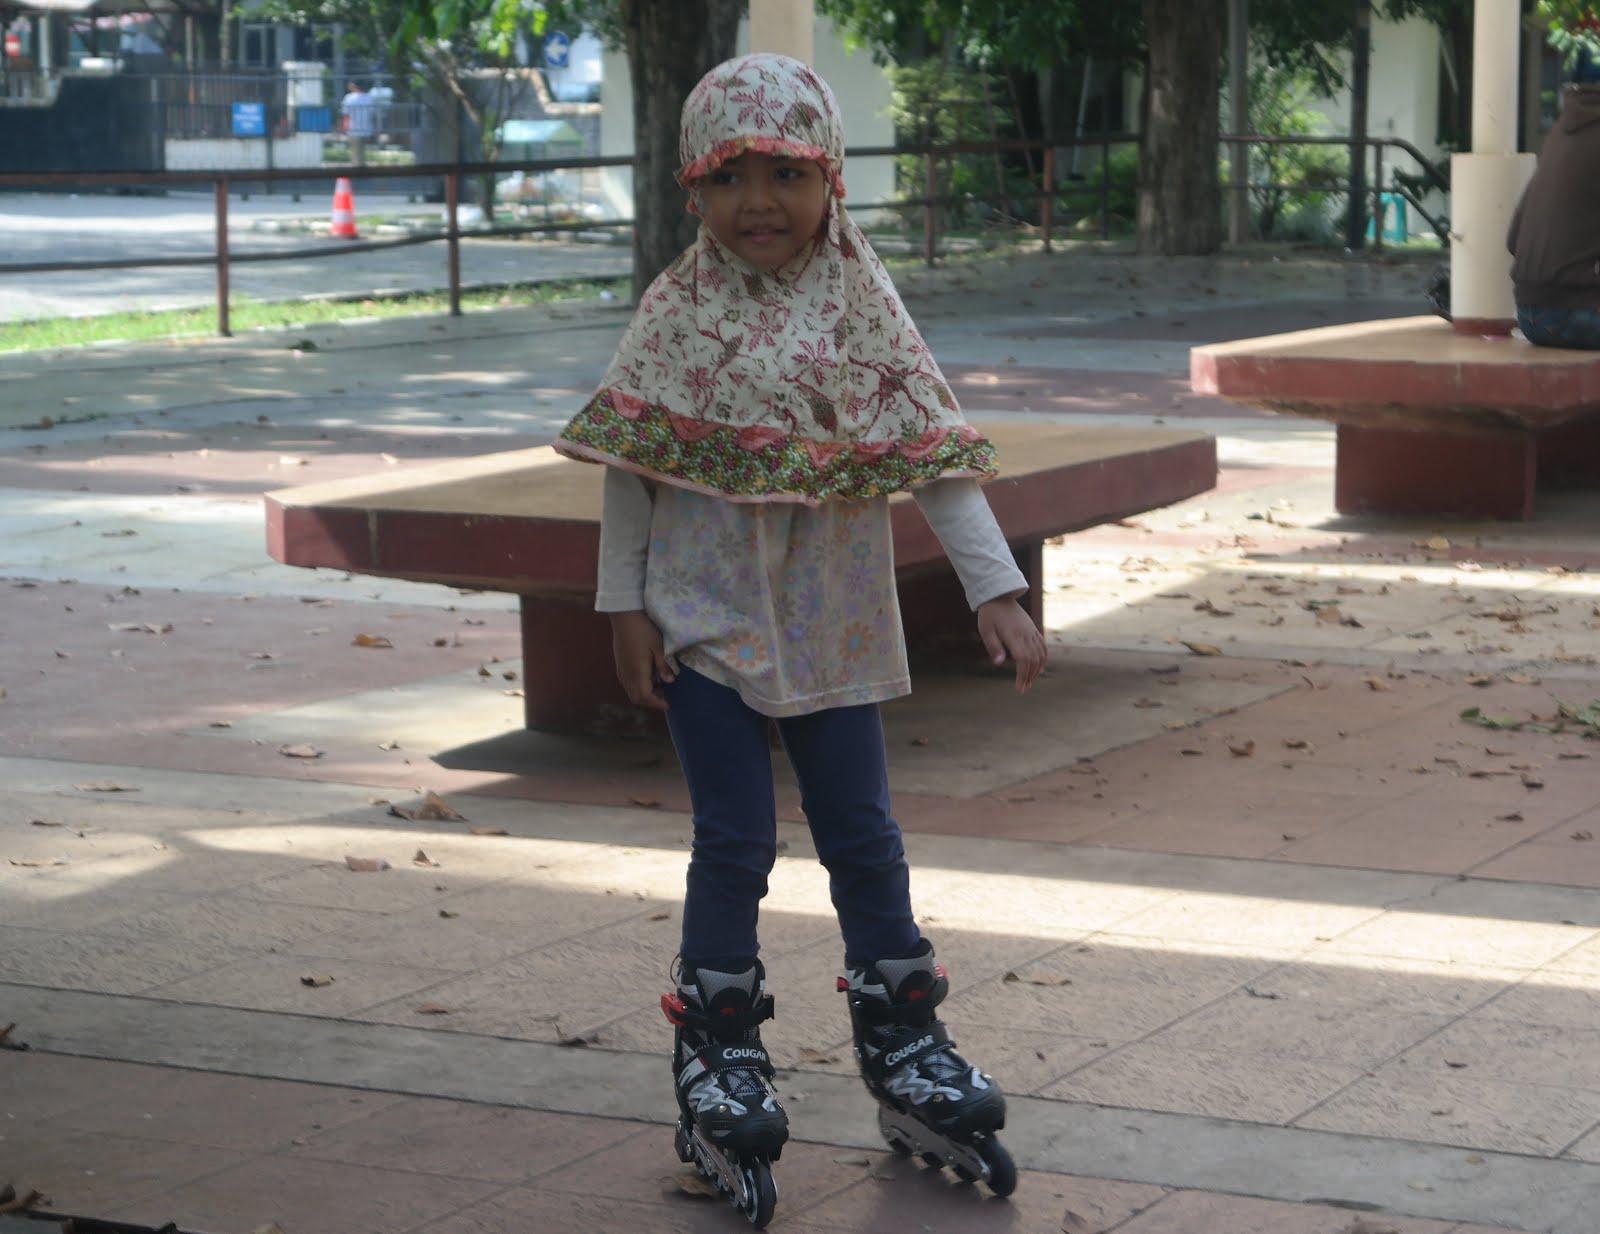 Cerita si Abi: Belajar Sepatu Roda Untuk Anak